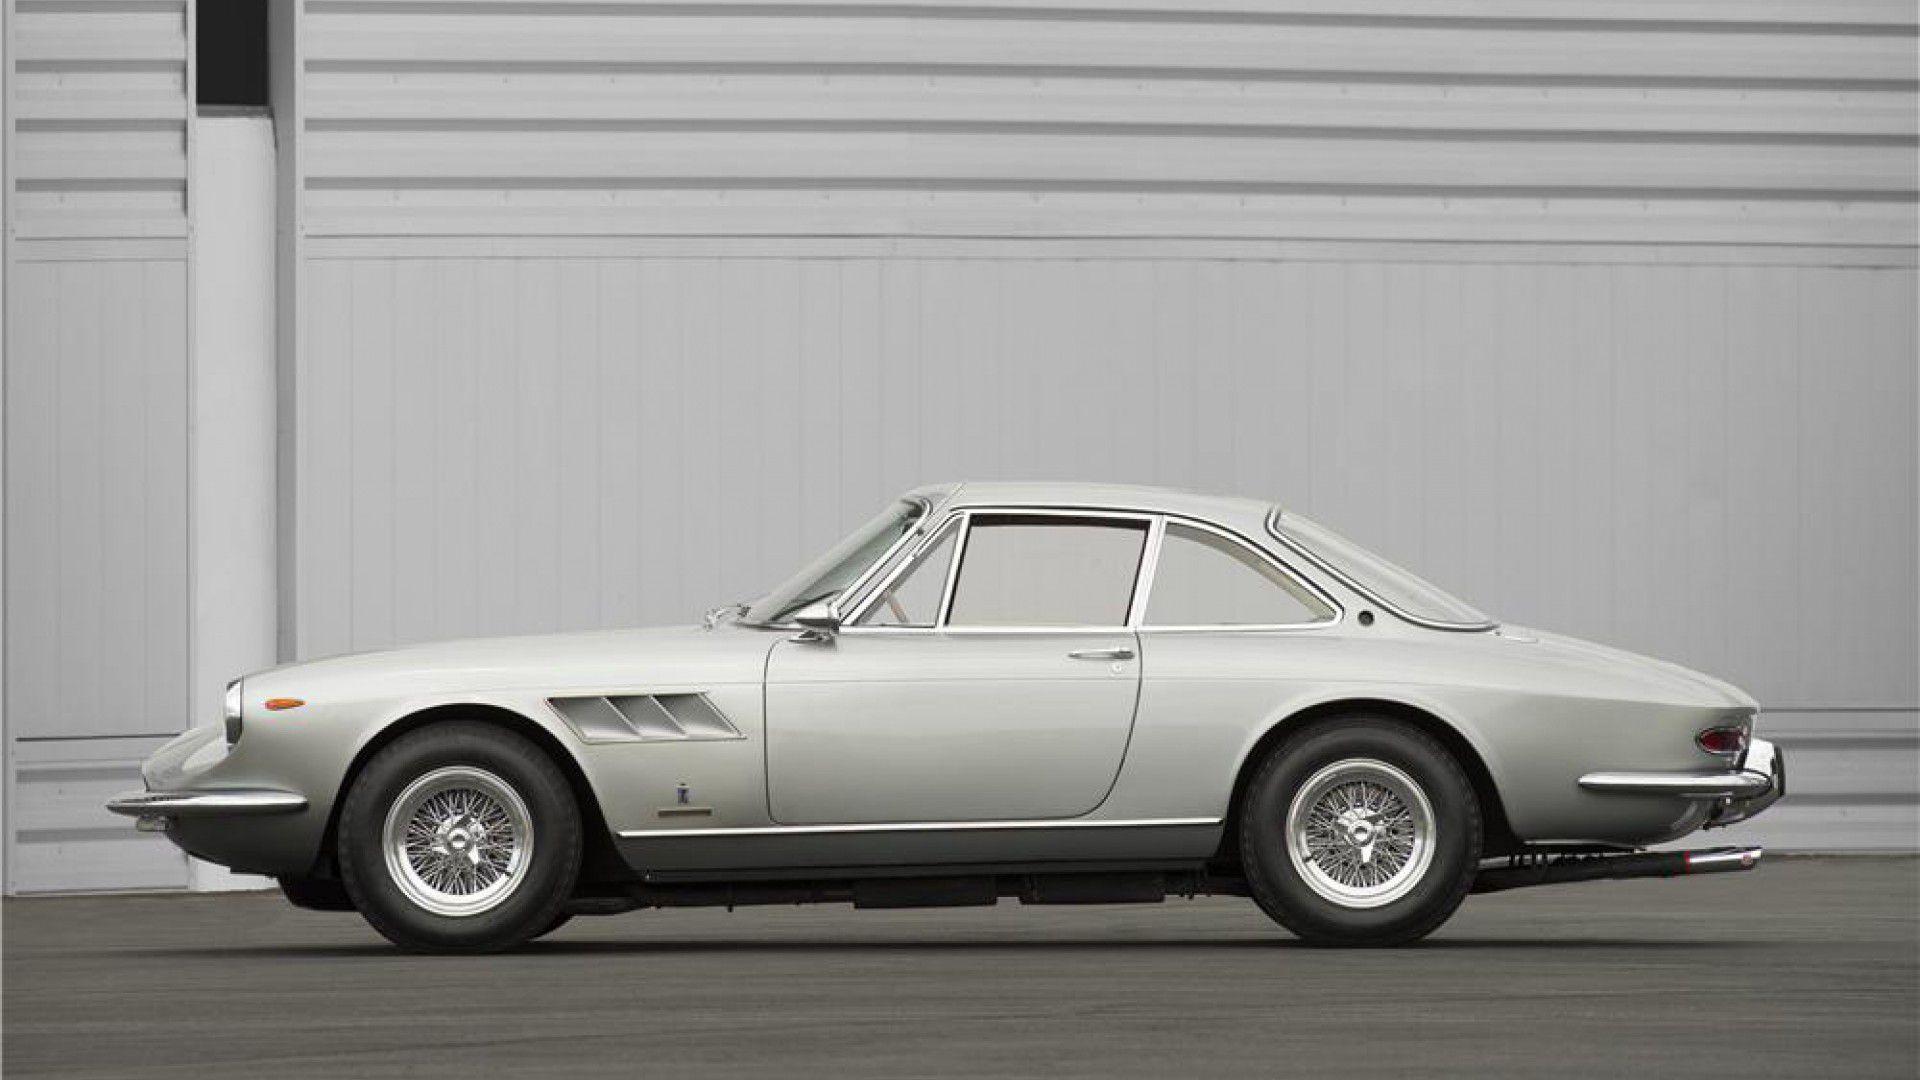 Ferrari 330 GTC Coupe